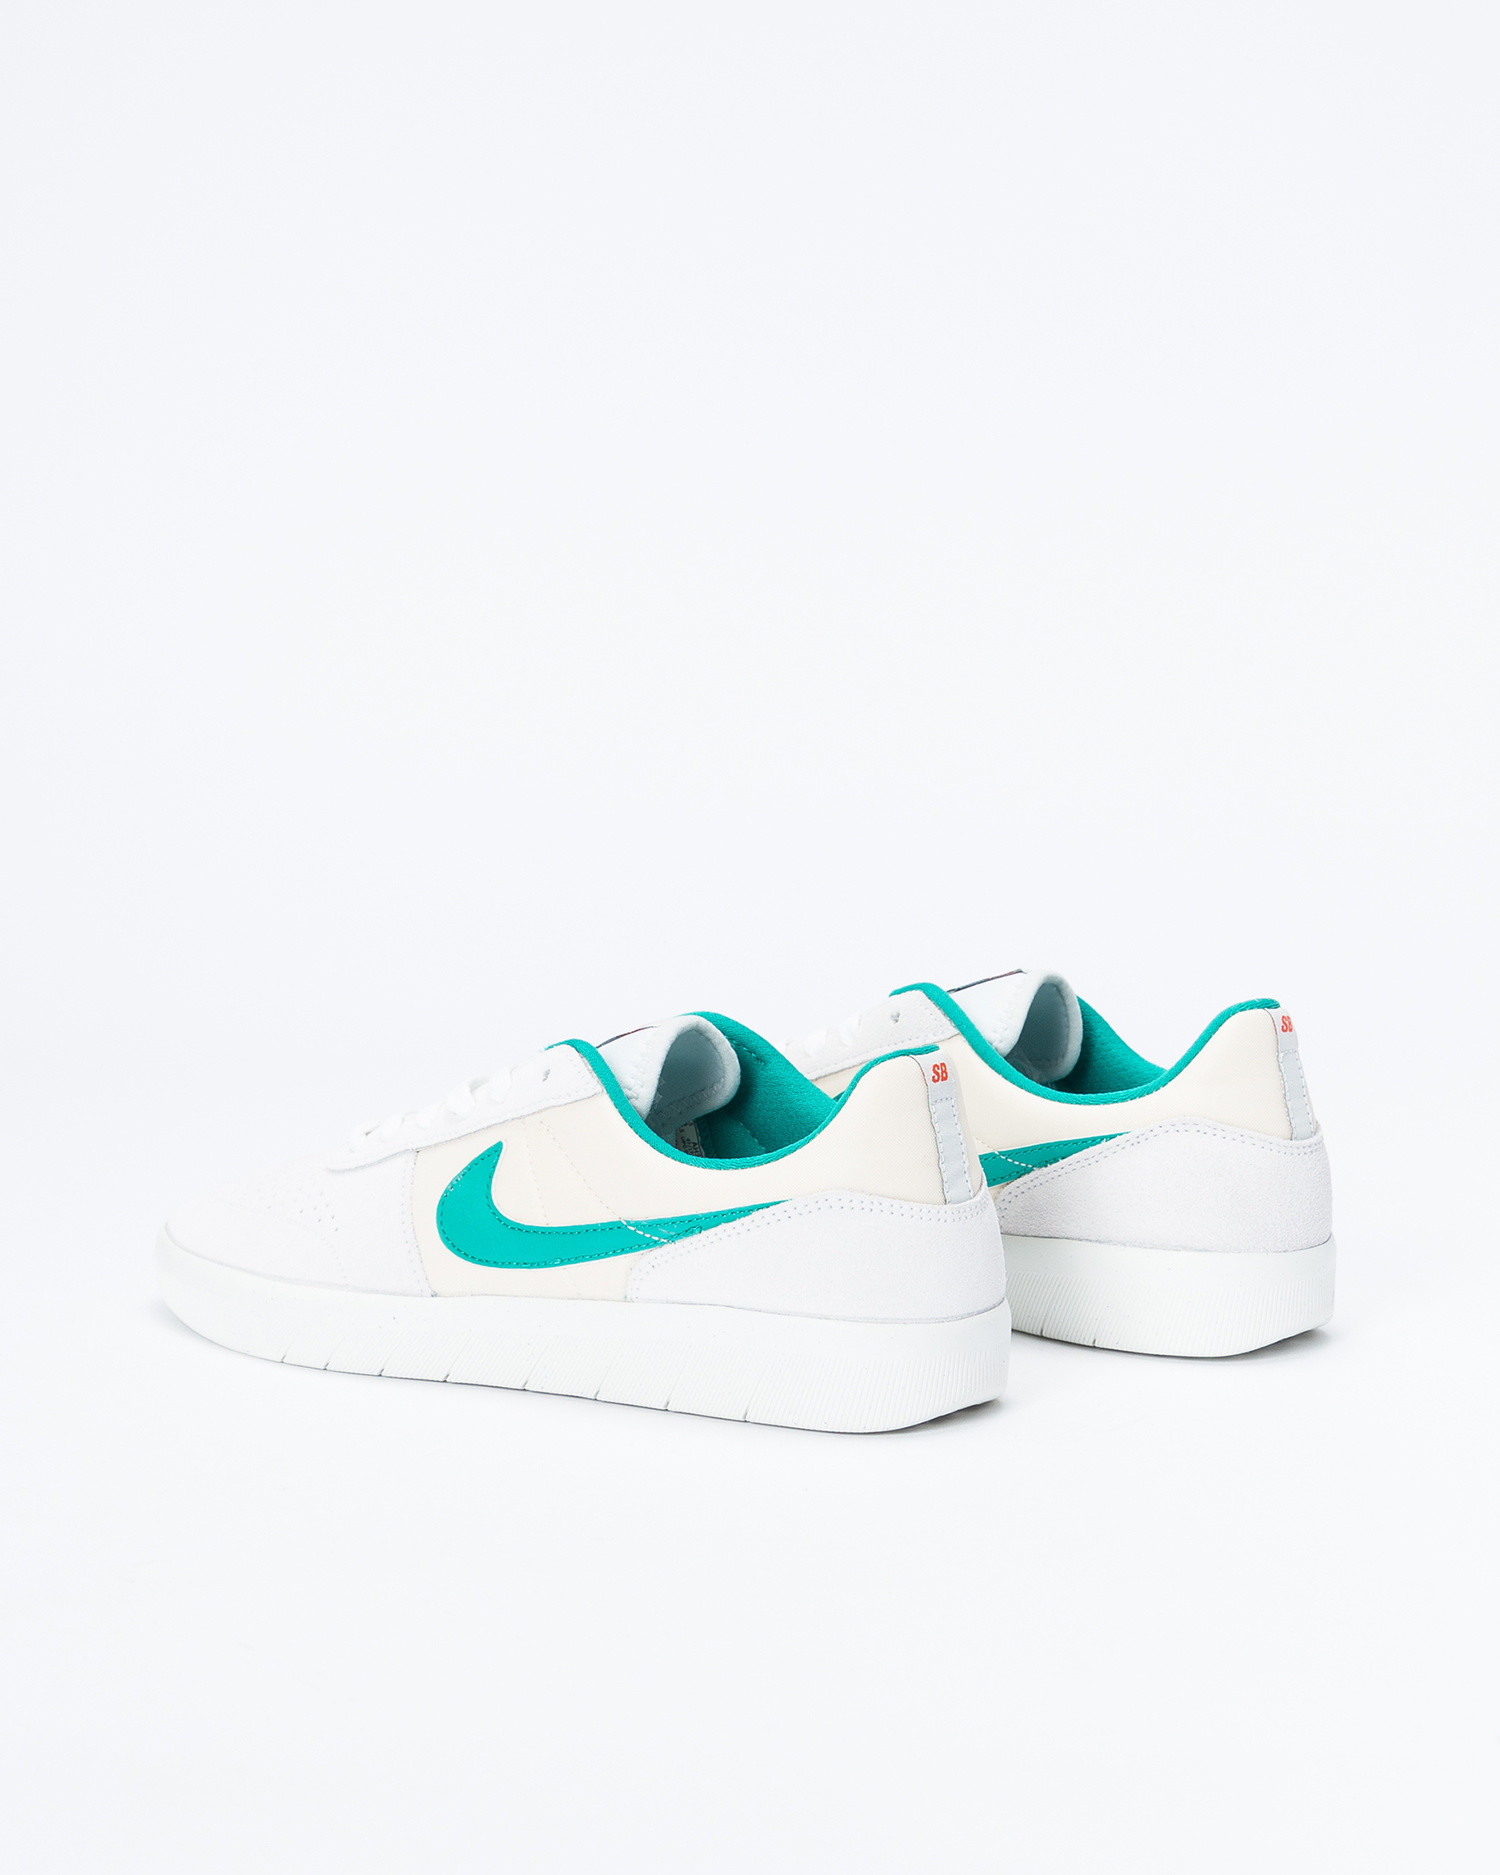 Nike SB team classic Photon dust/neptune green-light cream